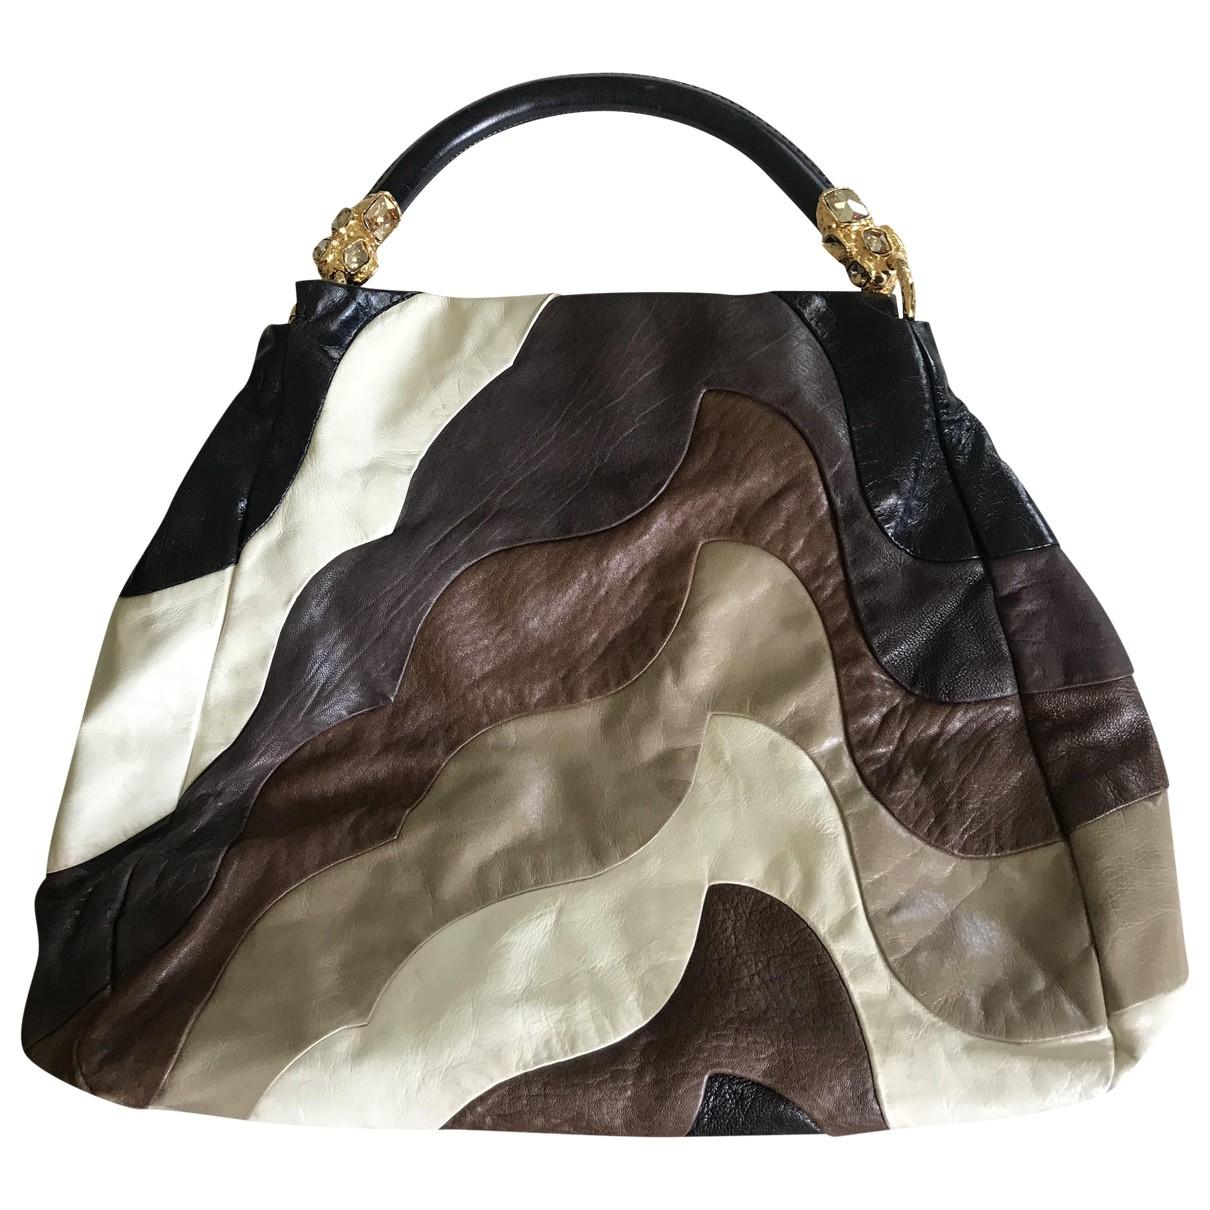 Miu Miu \N Multicolour Leather handbag for Women \N